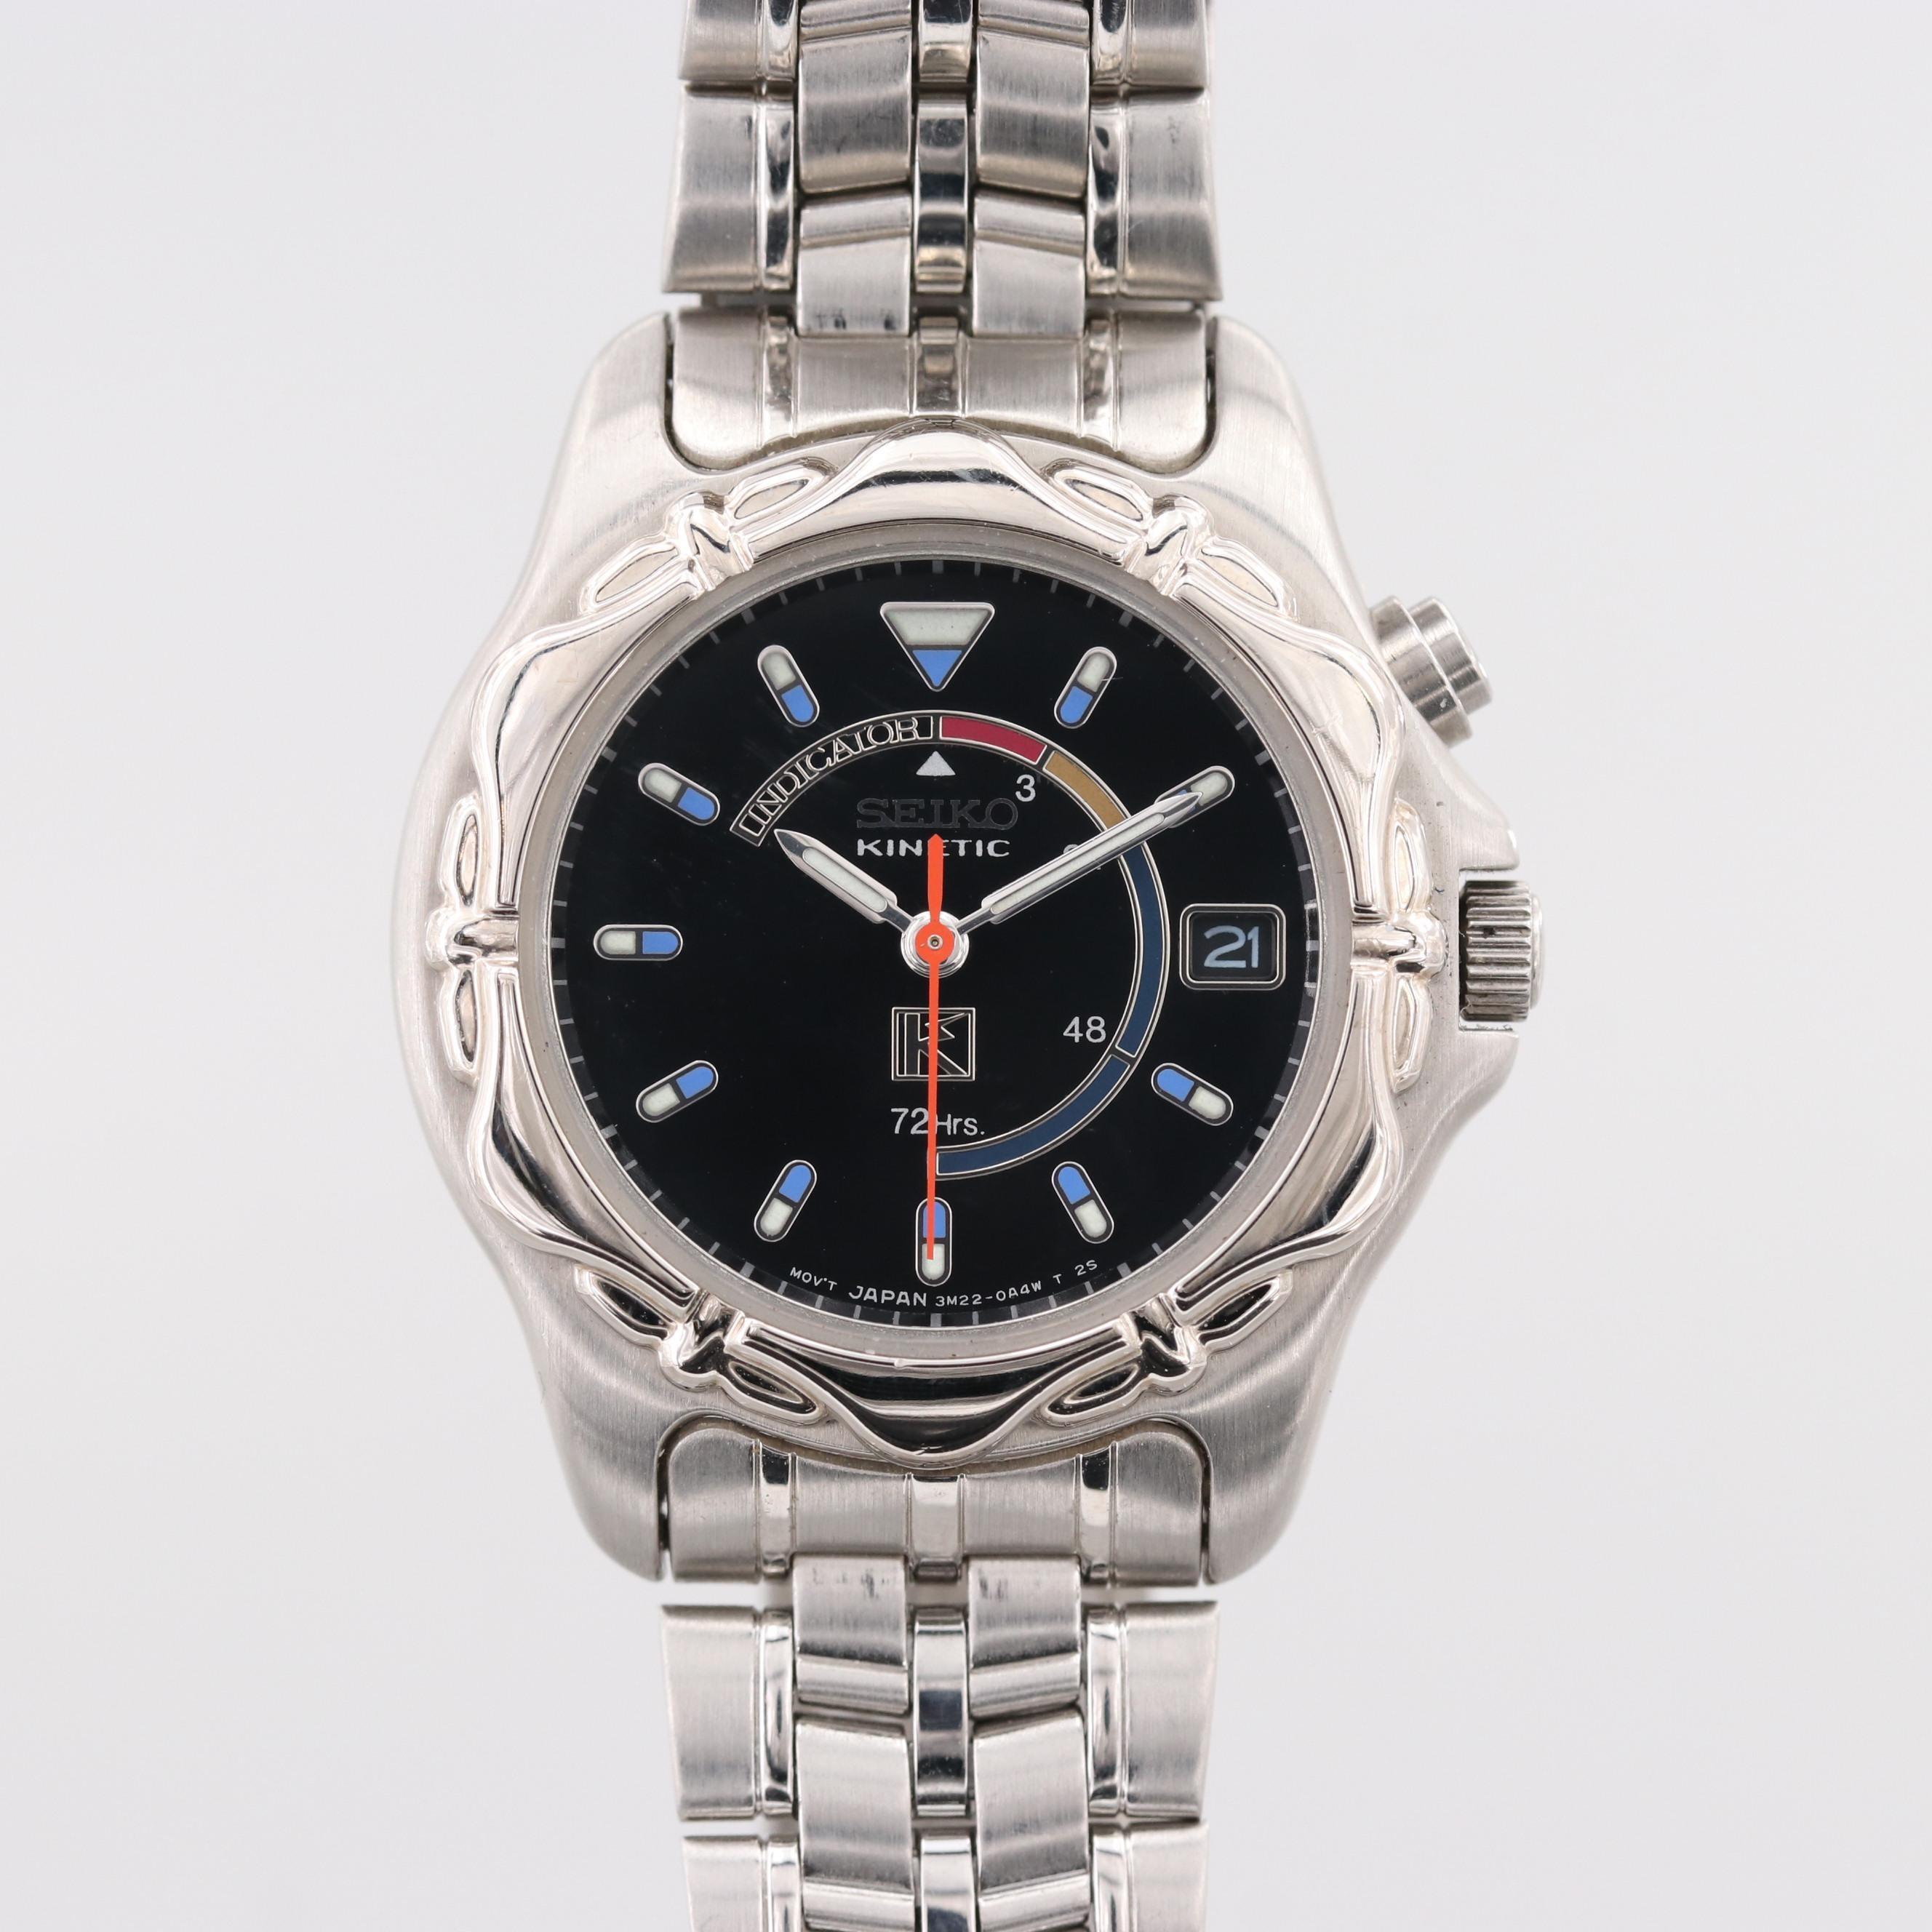 Vintage Seiko Kinetic Power Reserve Wristwatch